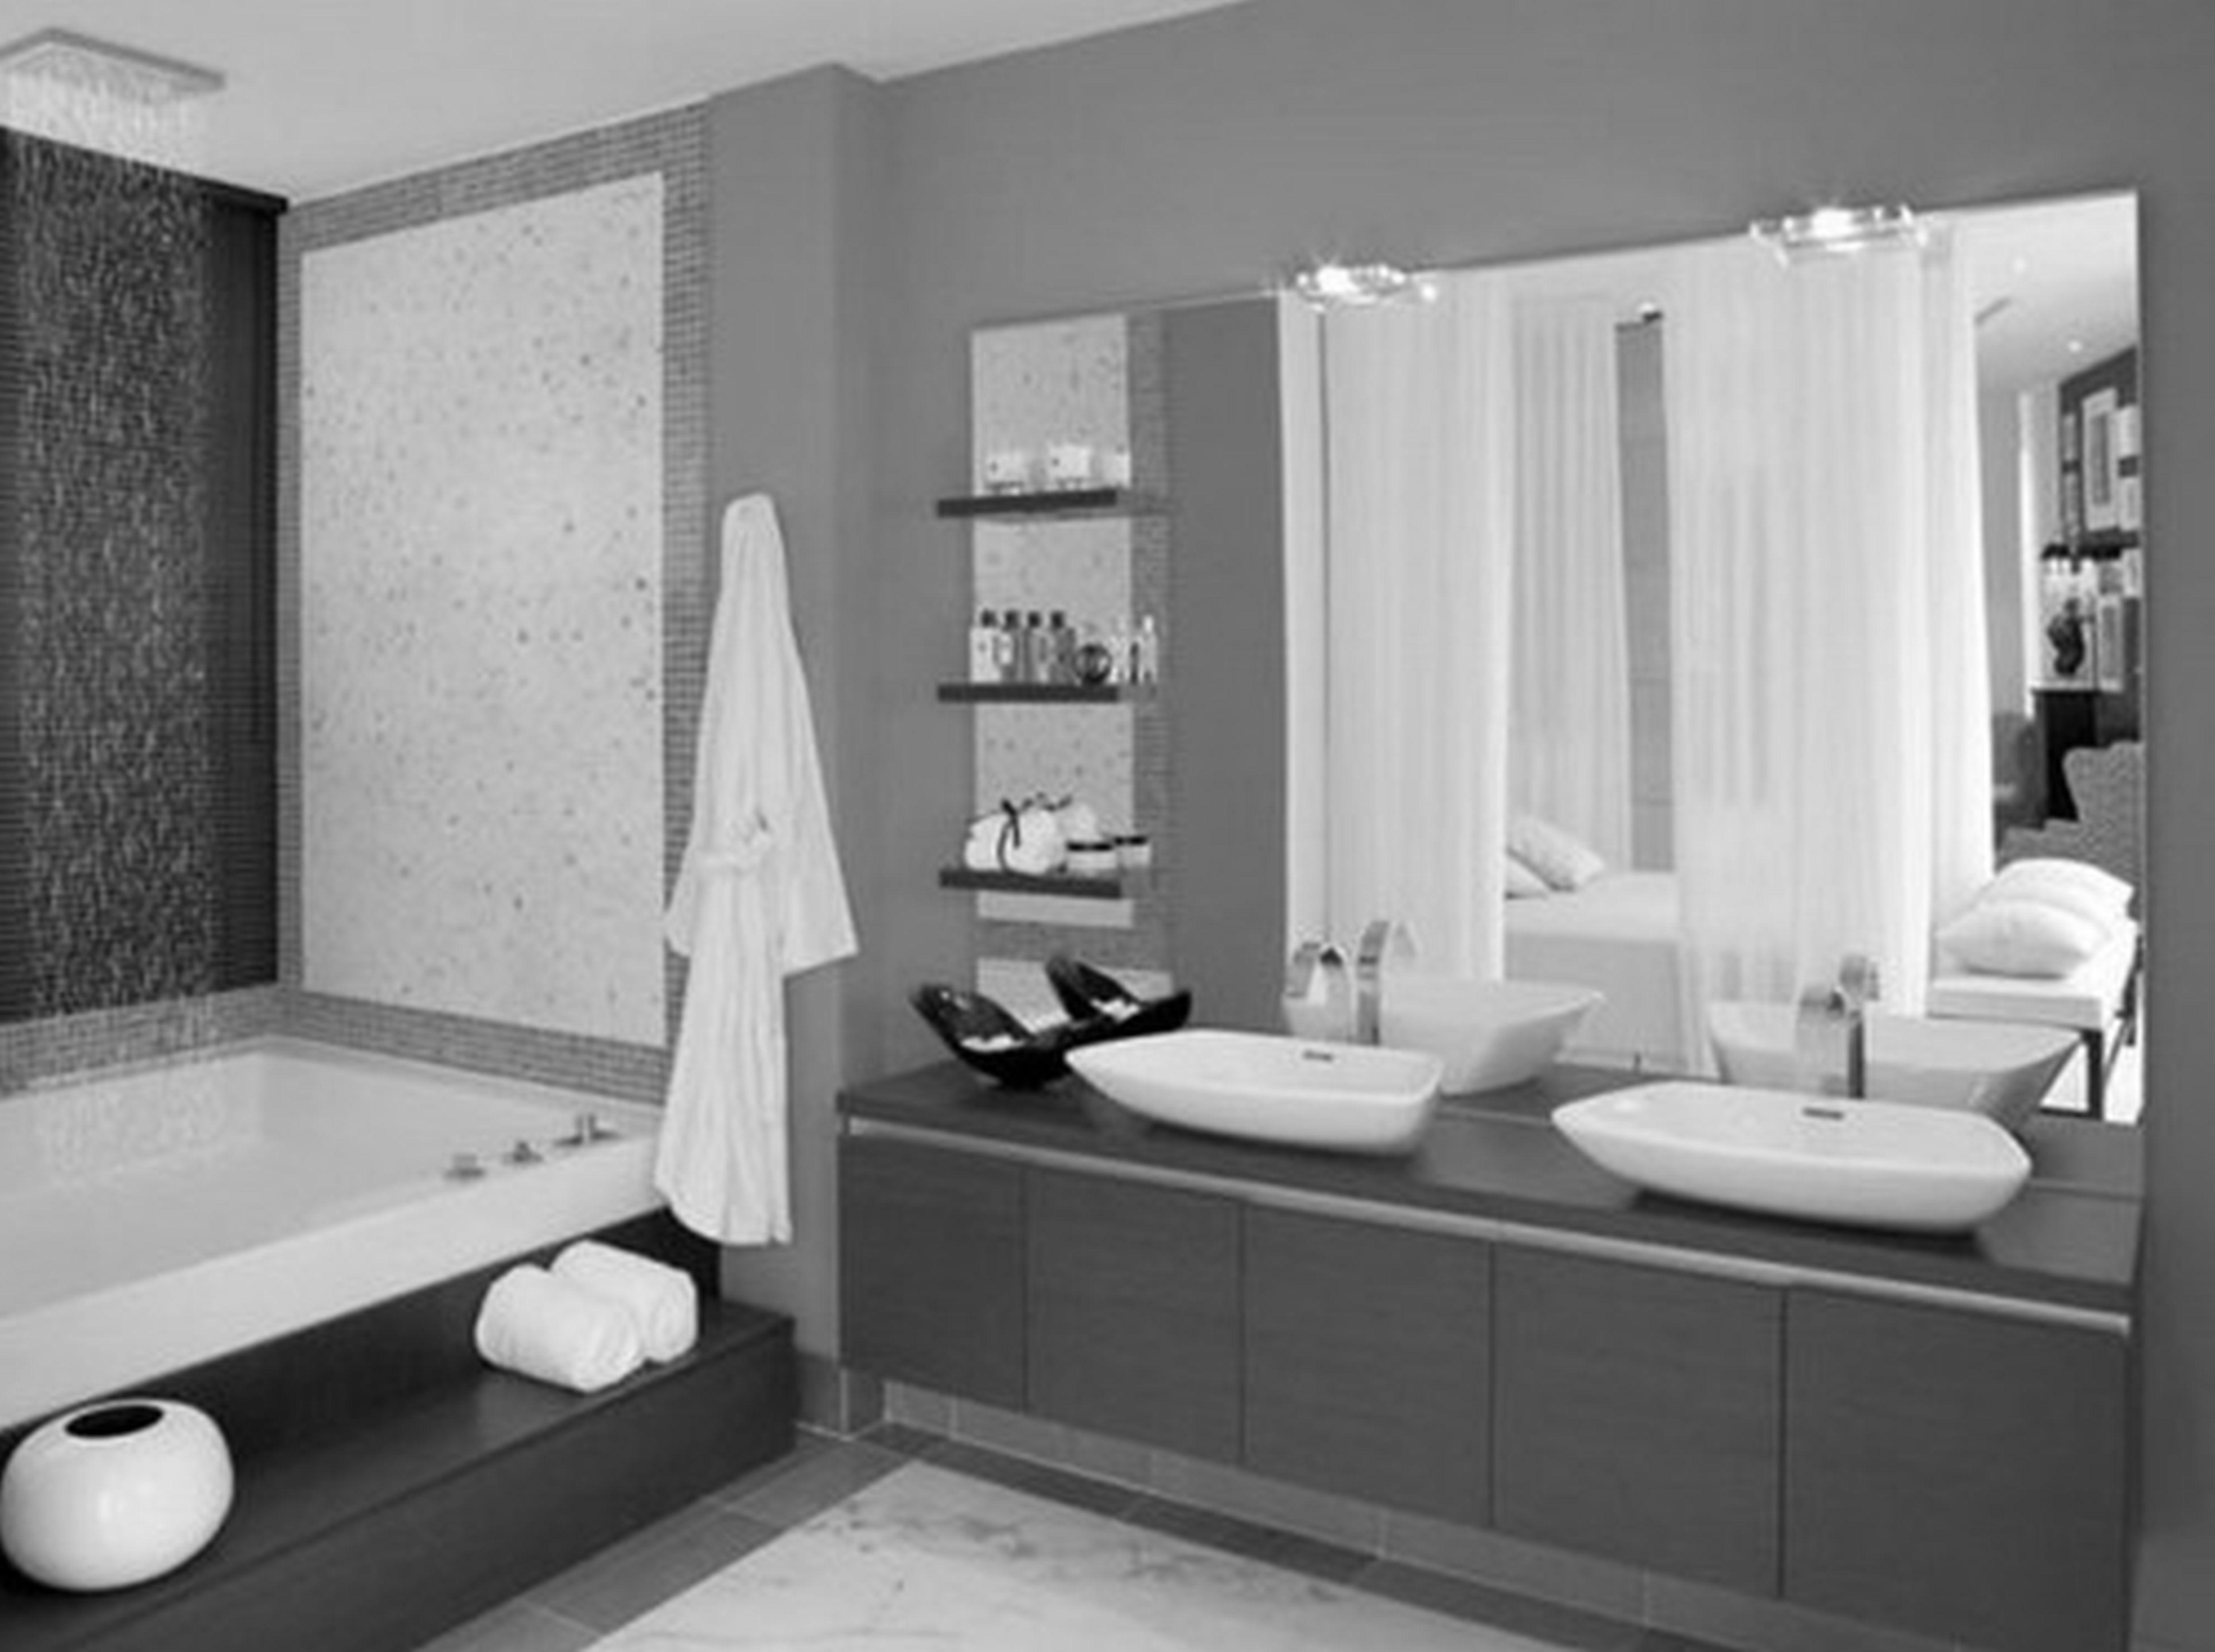 Get inspired with these gray bathroom decorating ideas Grey Bathroom DecorModern